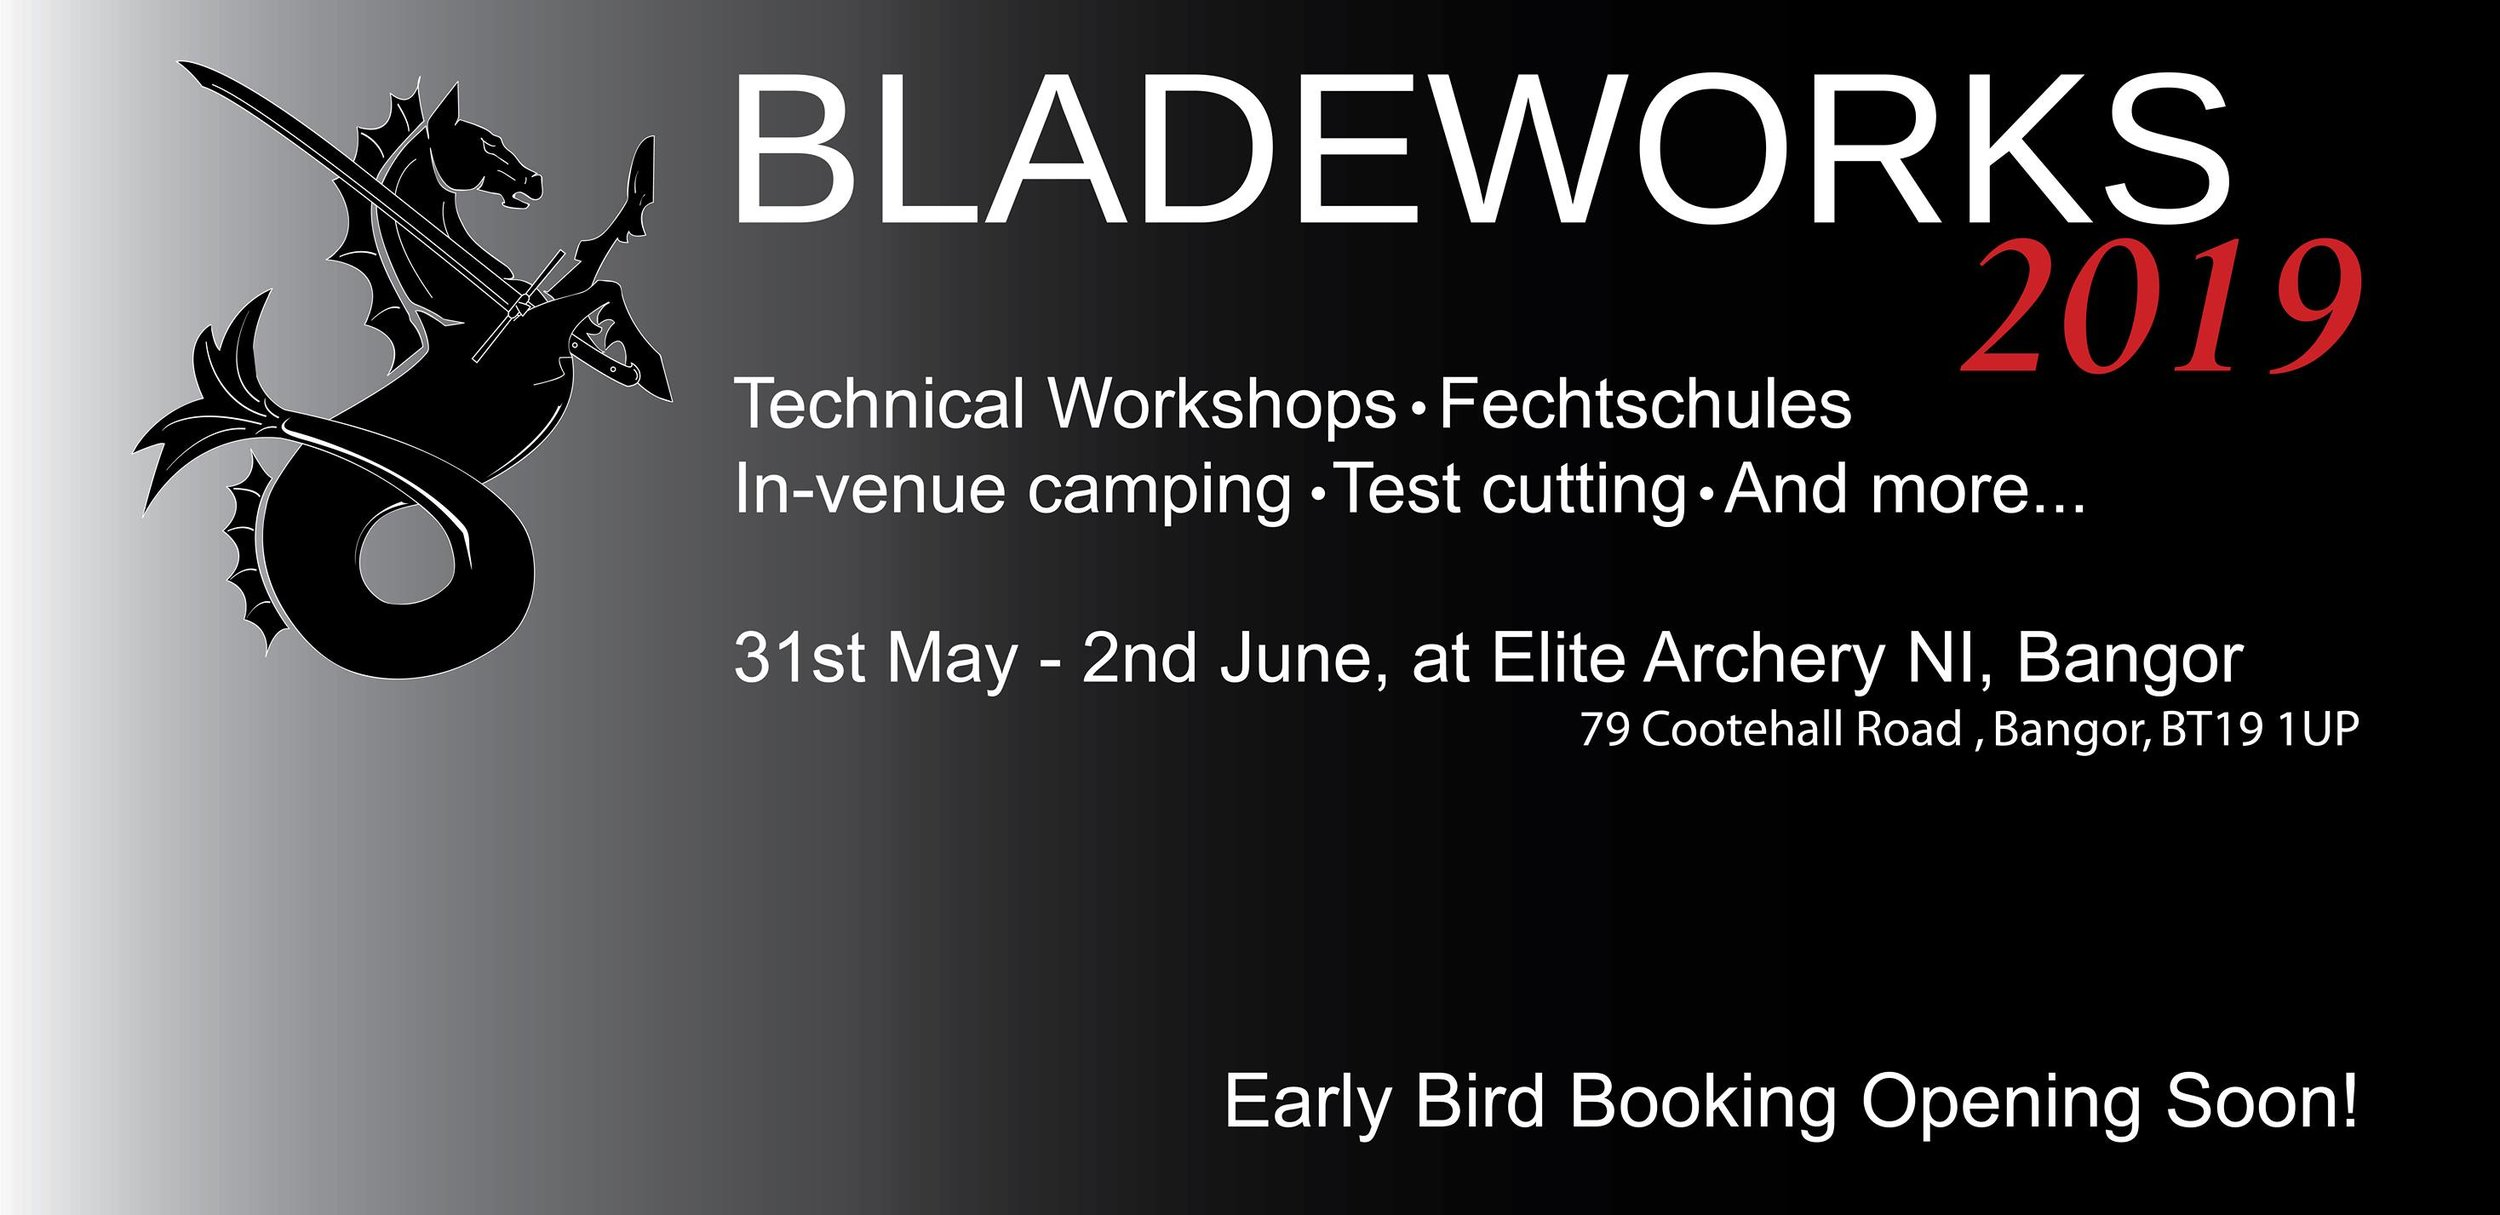 Belfast Bladeworks 2019.jpg